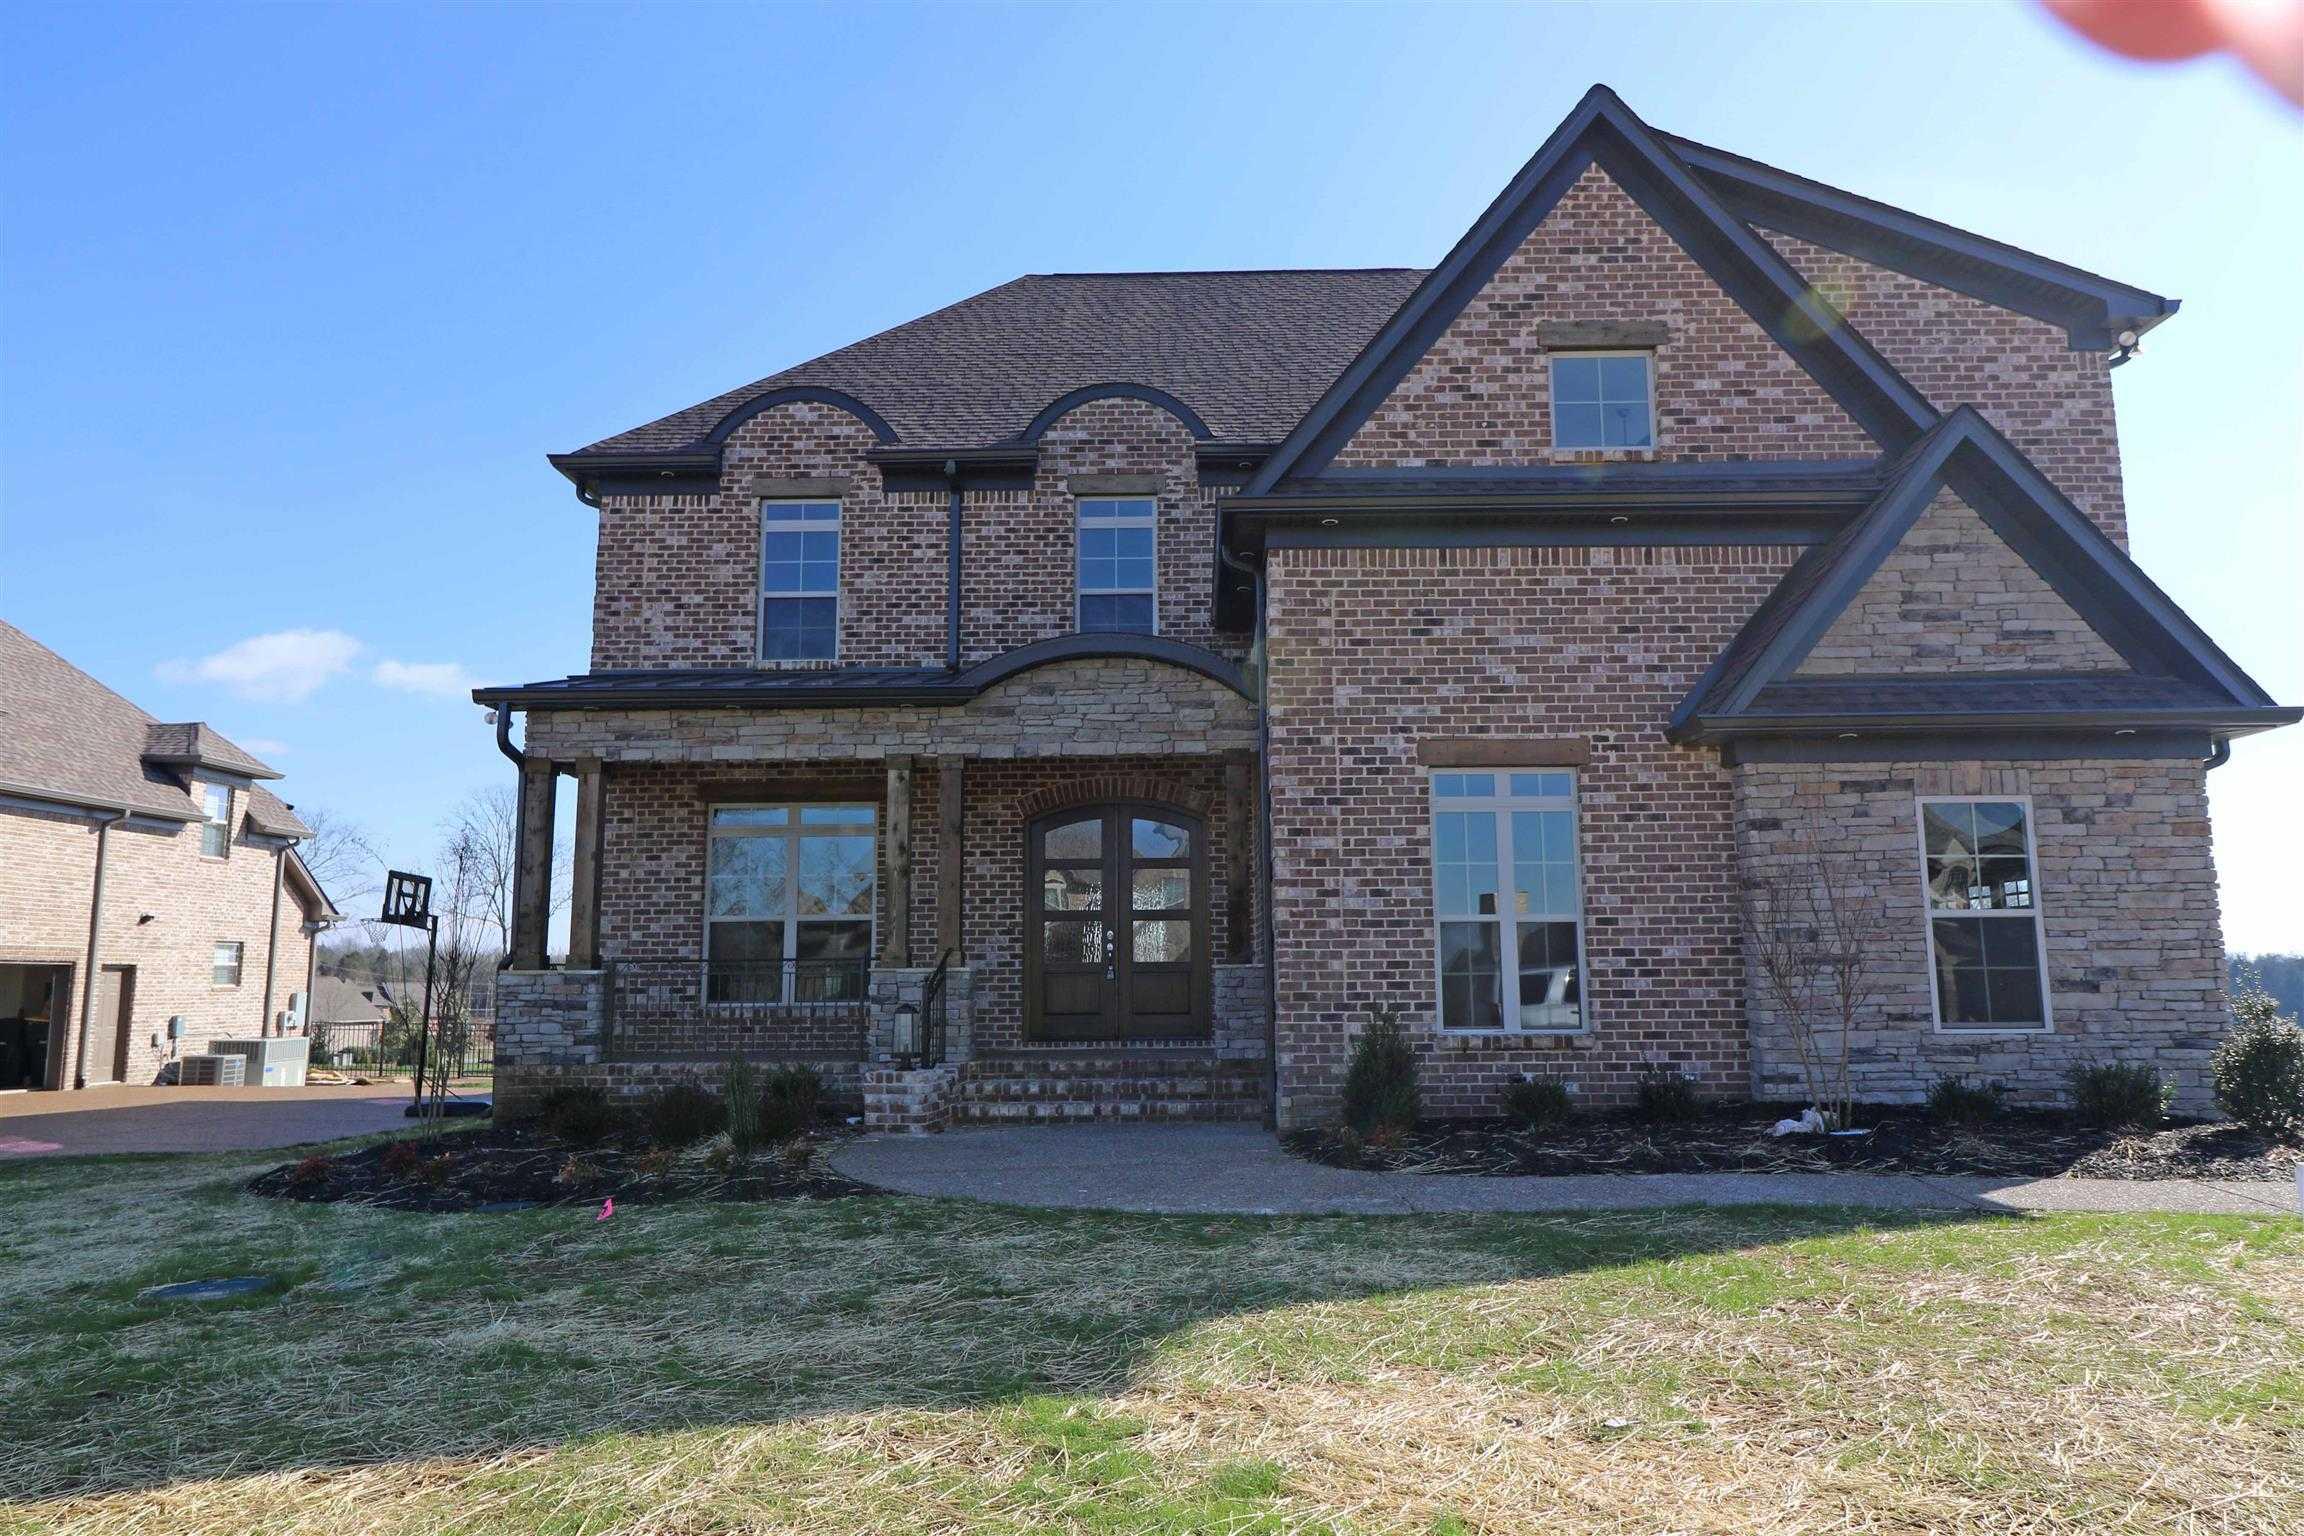 $699,900 - 4Br/4Ba -  for Sale in Wright Farms Sec. 4, Mount Juliet